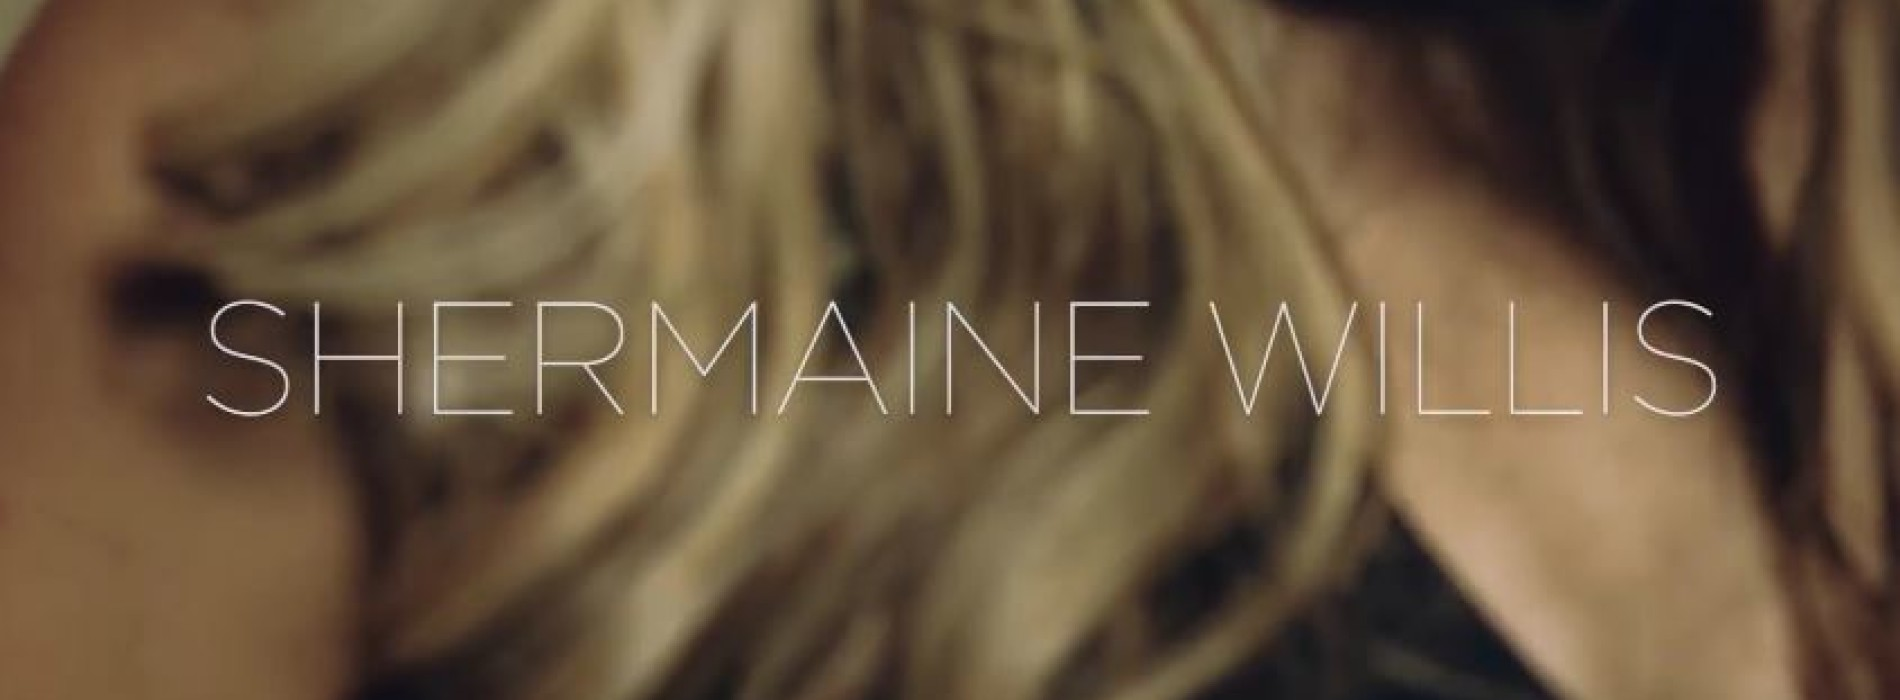 Shermaine Willis : Stone Cold (Live Studio Session)